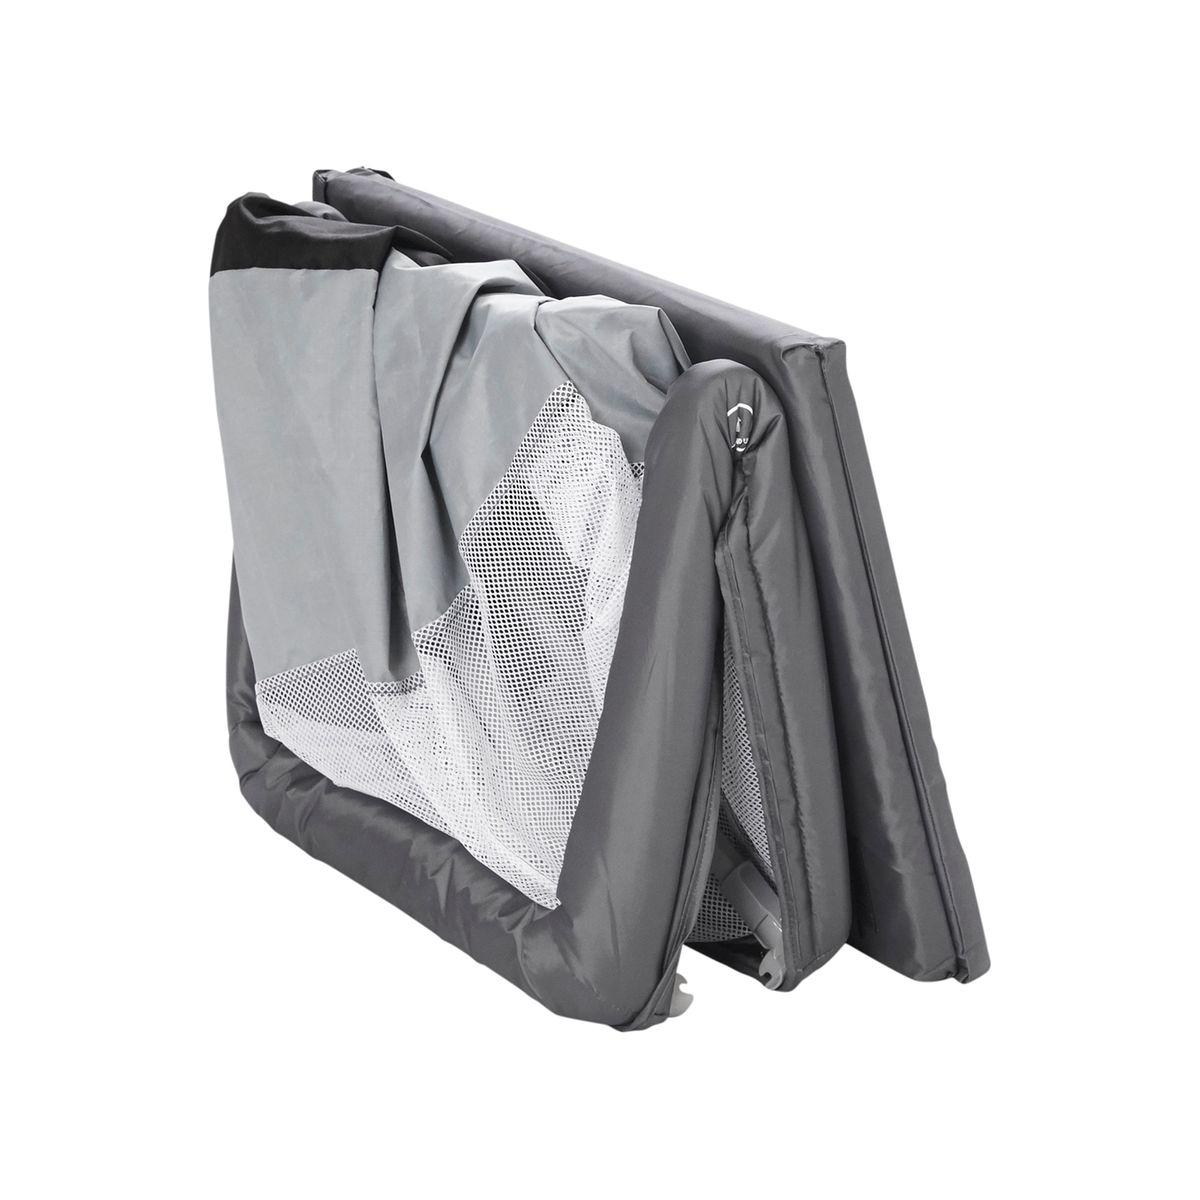 Lit parapluie ultra-léger   Lightbed